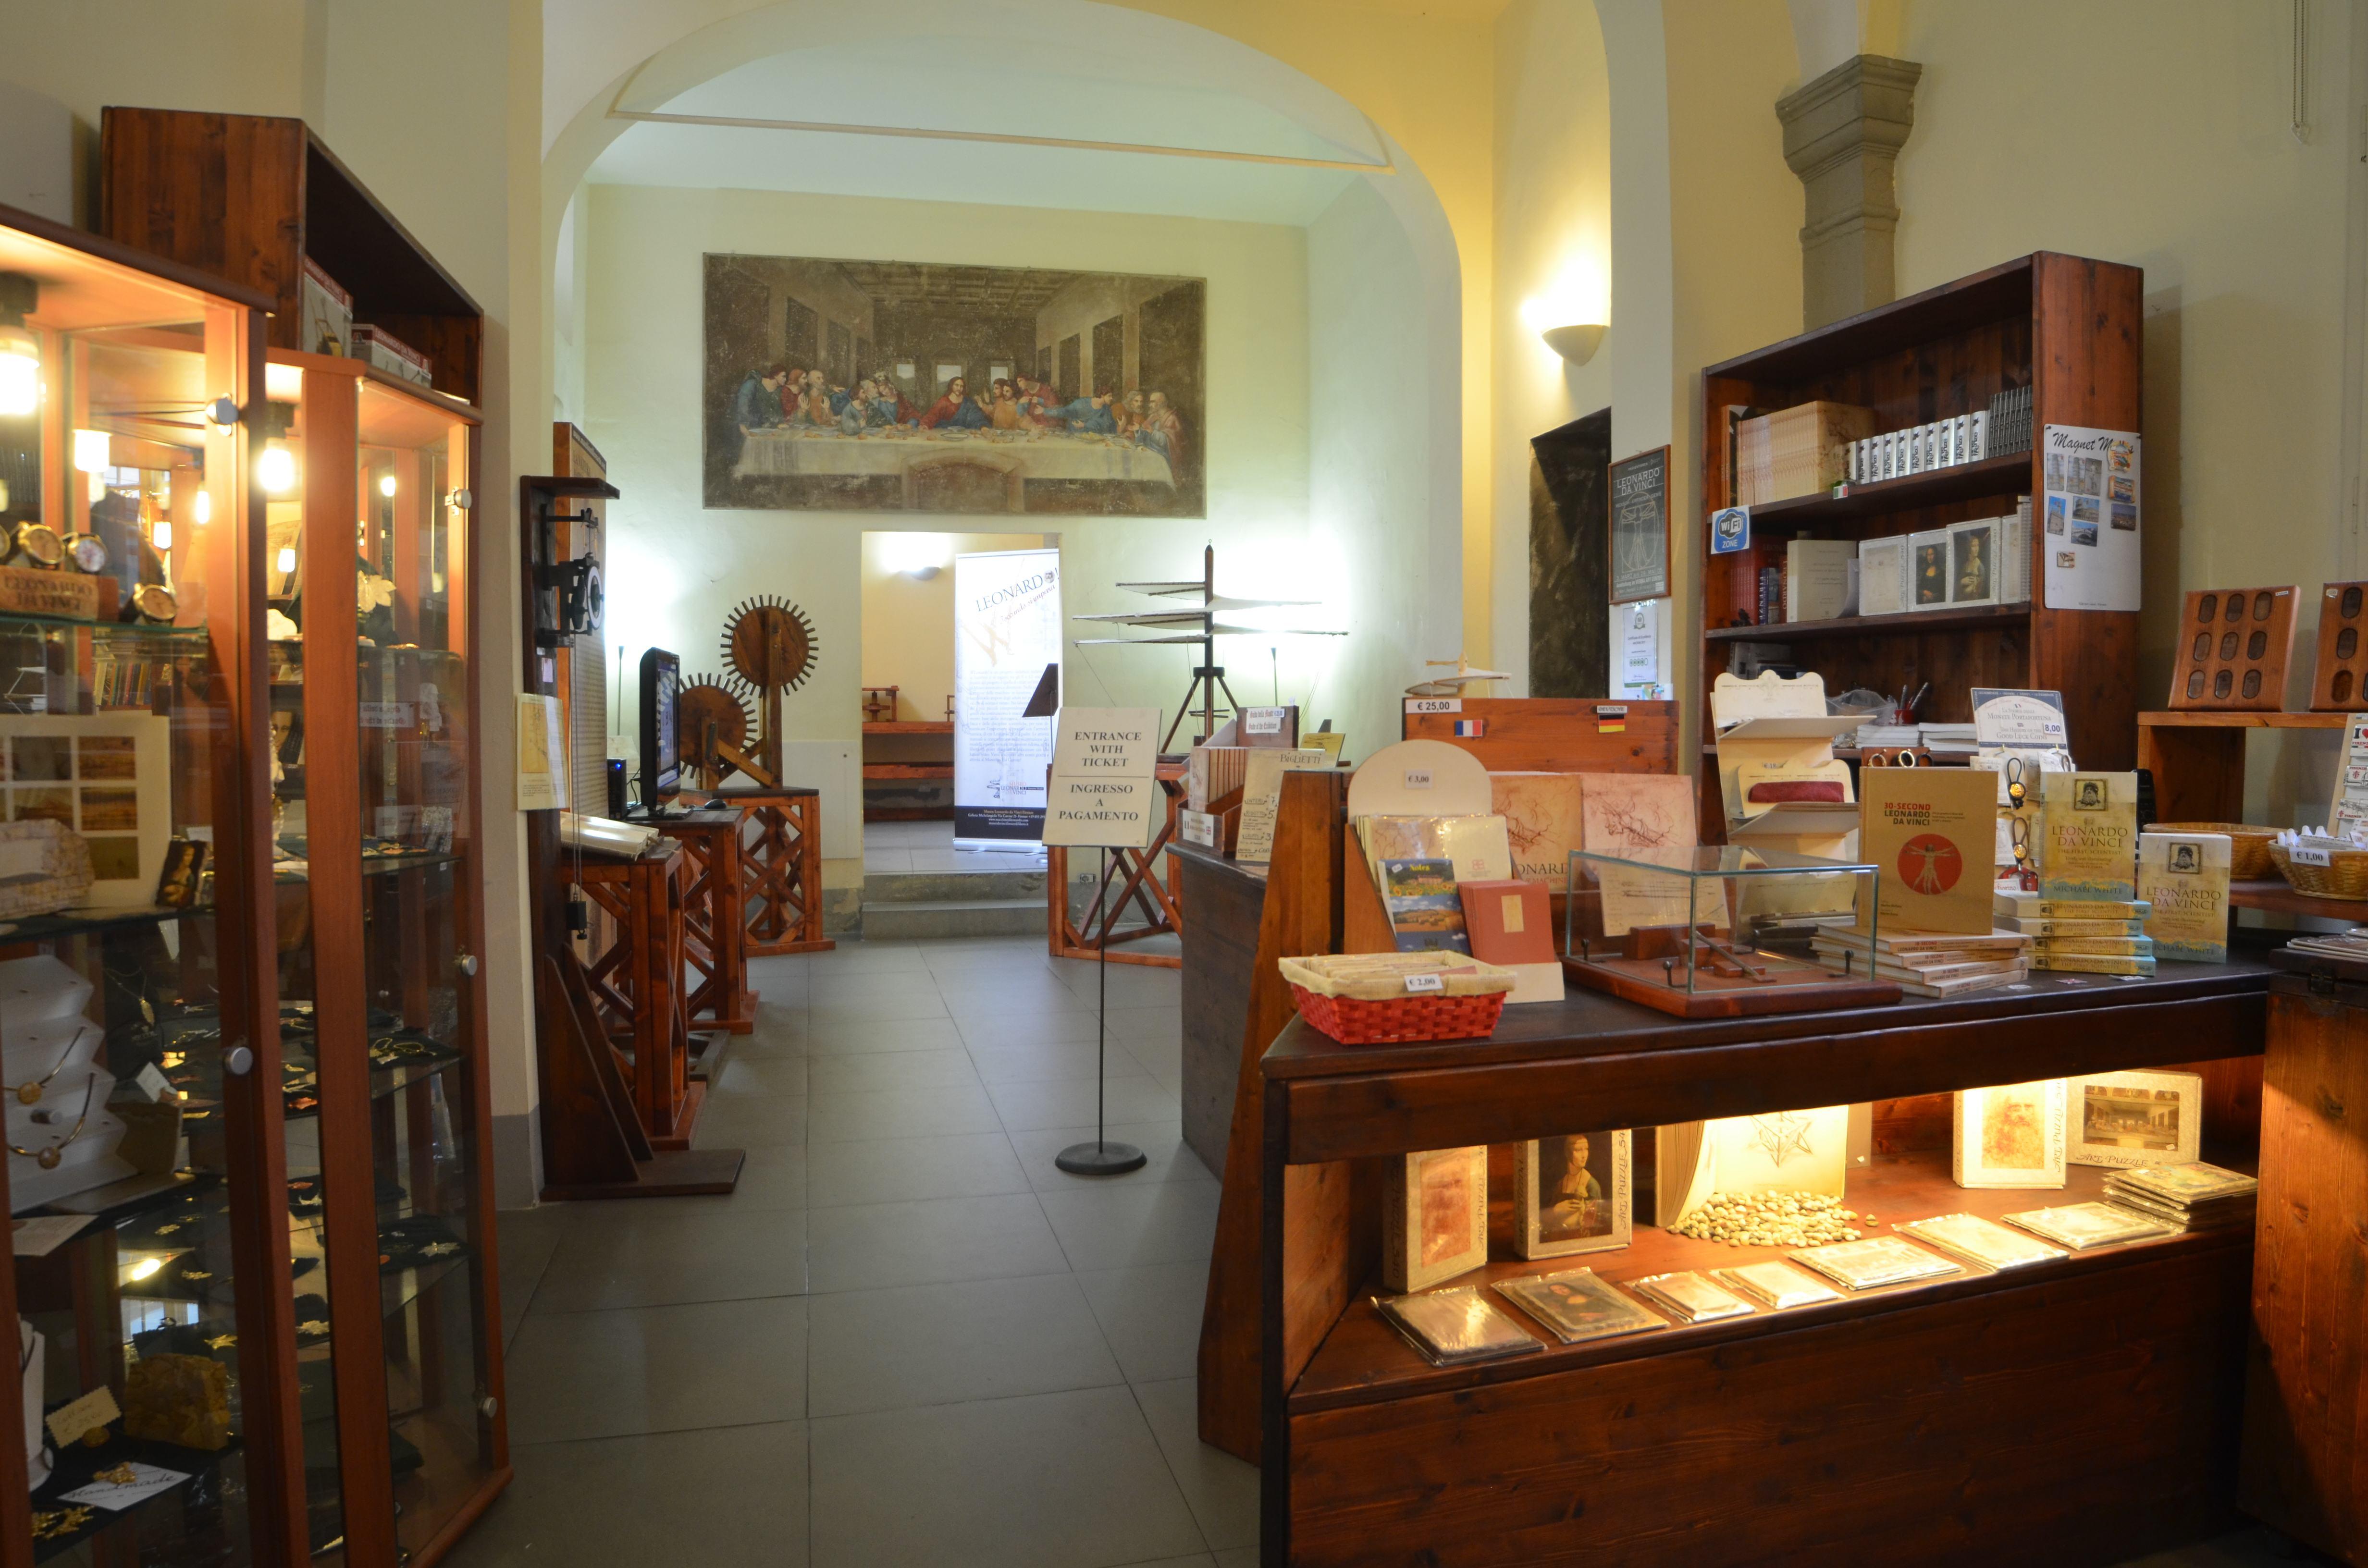 Museo Leonardo Da Vinci Firenze.Museo Leonardo Da Vinci Firenze Lo Conoscete Firenze Formato Famiglia